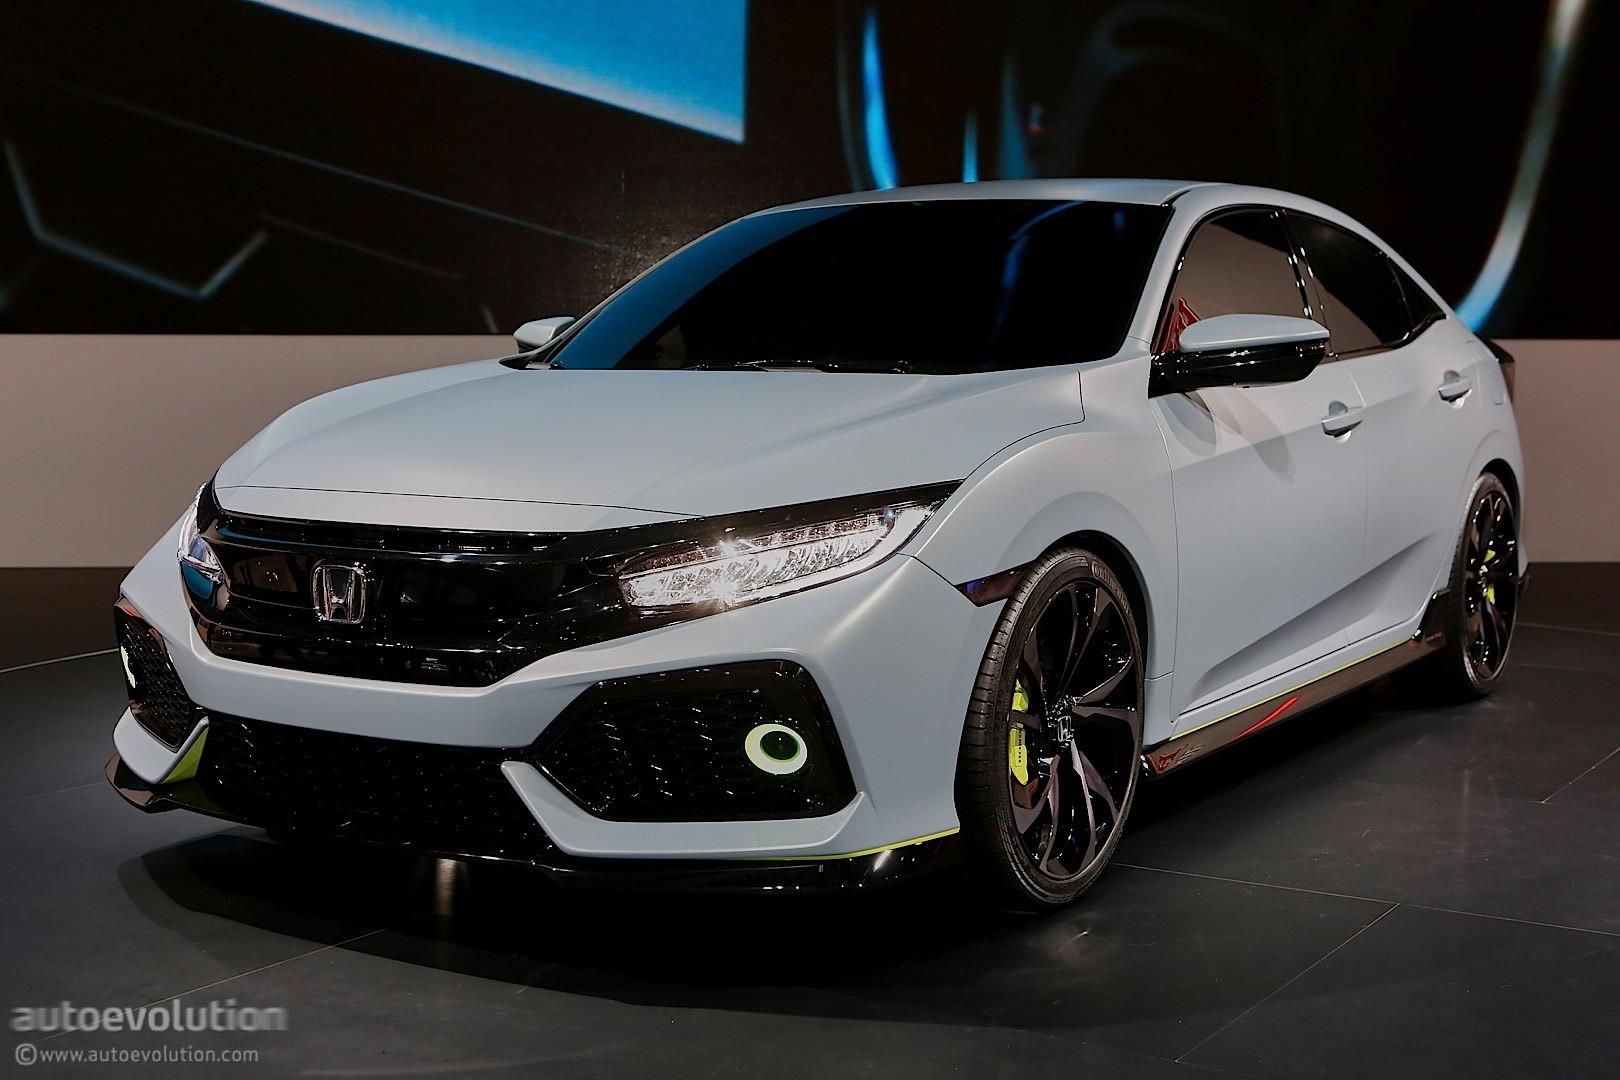 2017 honda civic hatchback price release date news specs for Honda civic hatchback dimensions